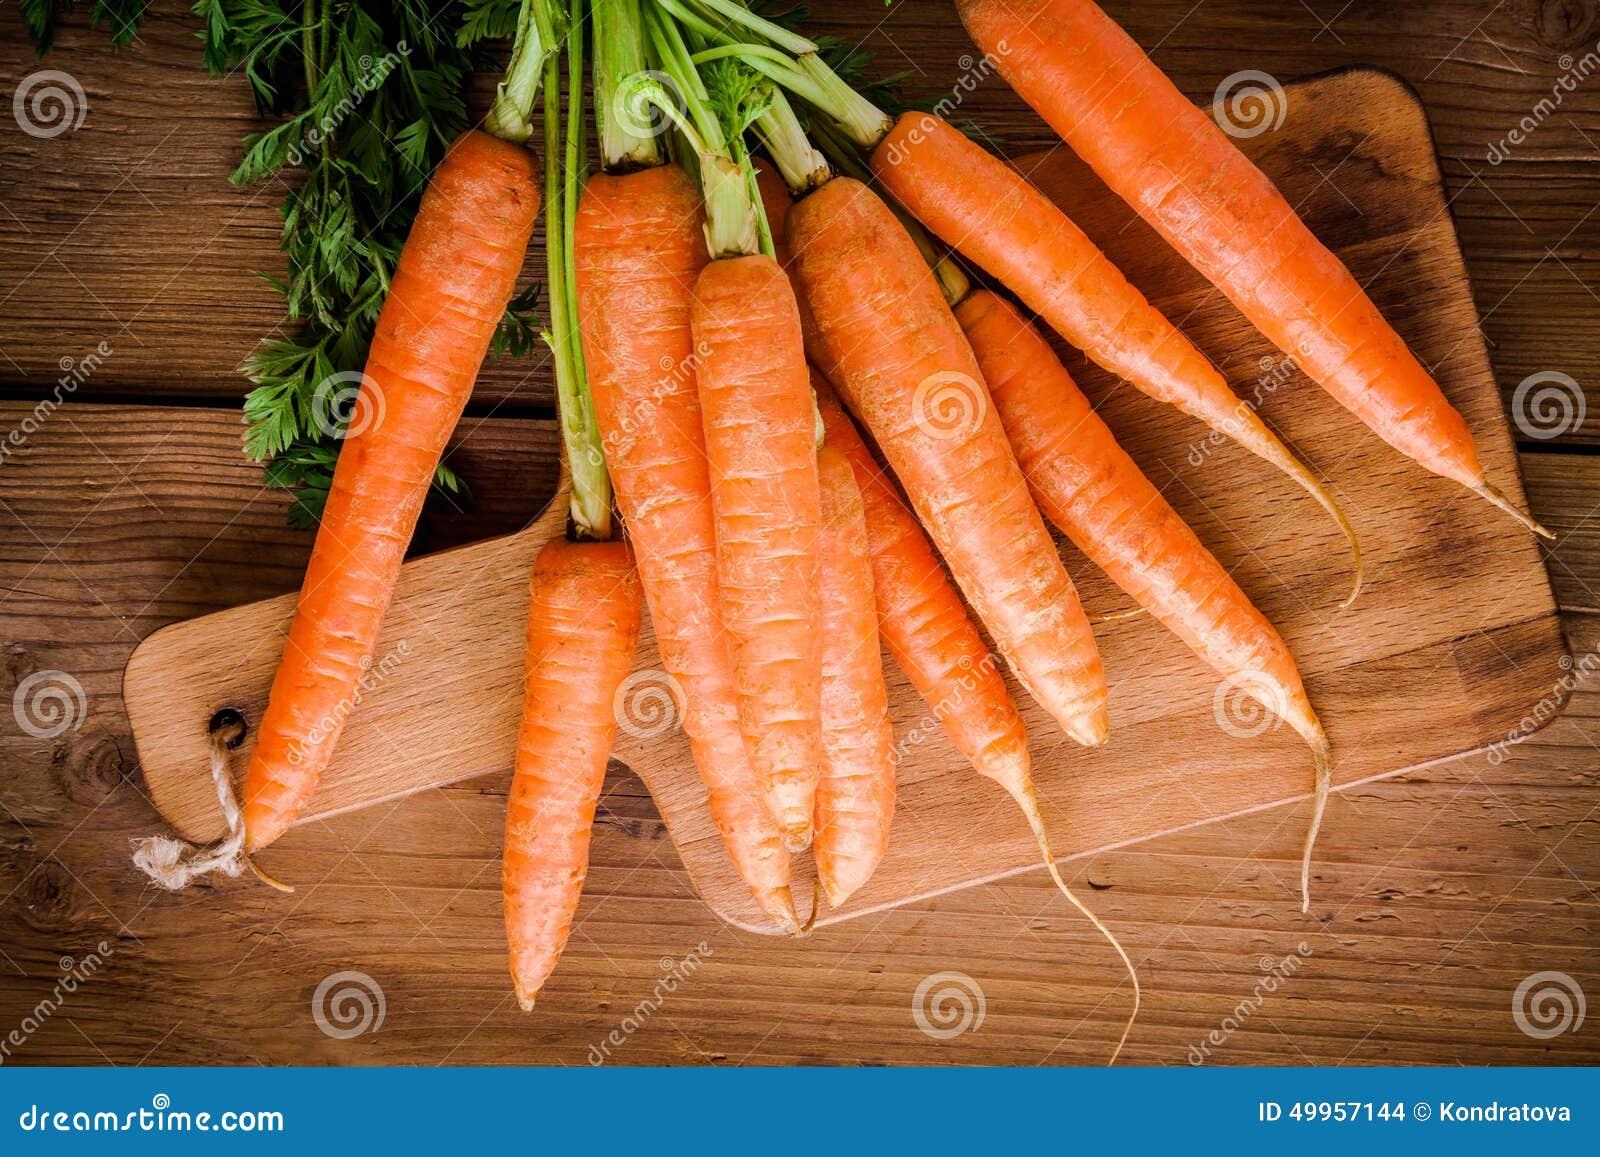 Fresh carrots bunch on cutting board